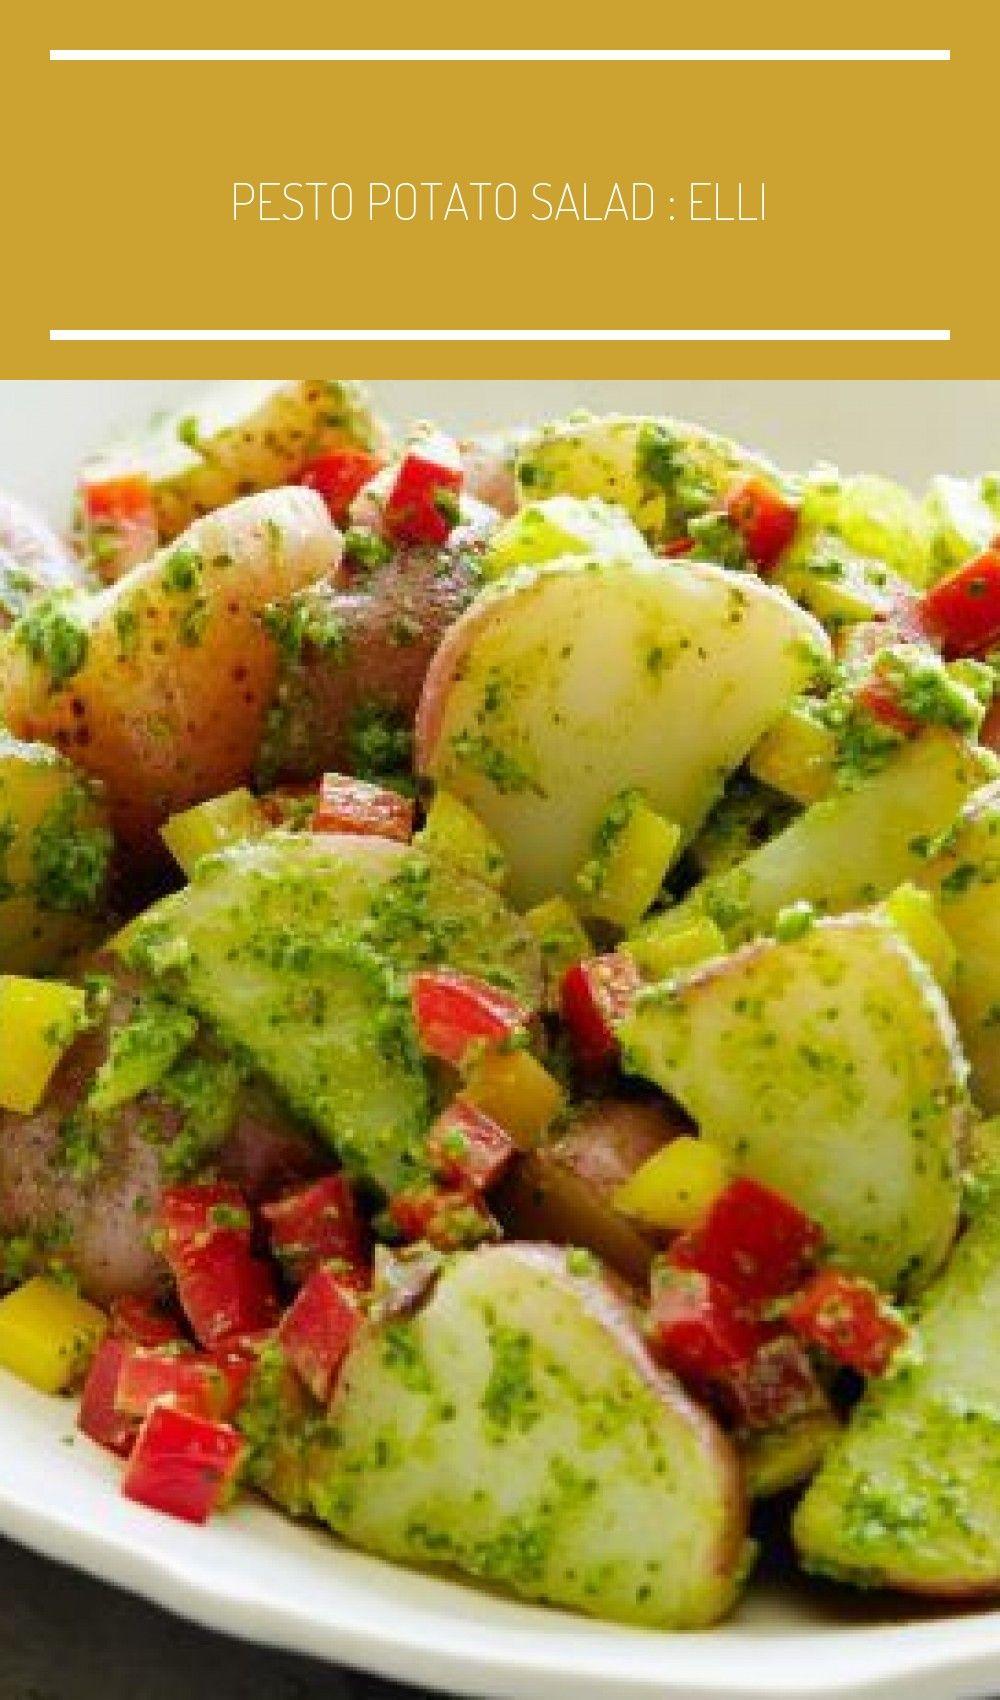 Pesto Potato Salad : Ellie puts a twist on basic potato salad by tossing boiled ...,  #Basic #Boiled #Drink #Ellie #Food #MealPlan #MealPlanning #Meat #Pesto #Planning #Potato #puts #Salad #Snacks #tossing #twist #ensaladas de verano de patata Pesto Potato Salad : Ellie puts a twist on basic potato salad by tossing boiled ...,  #Basic ...